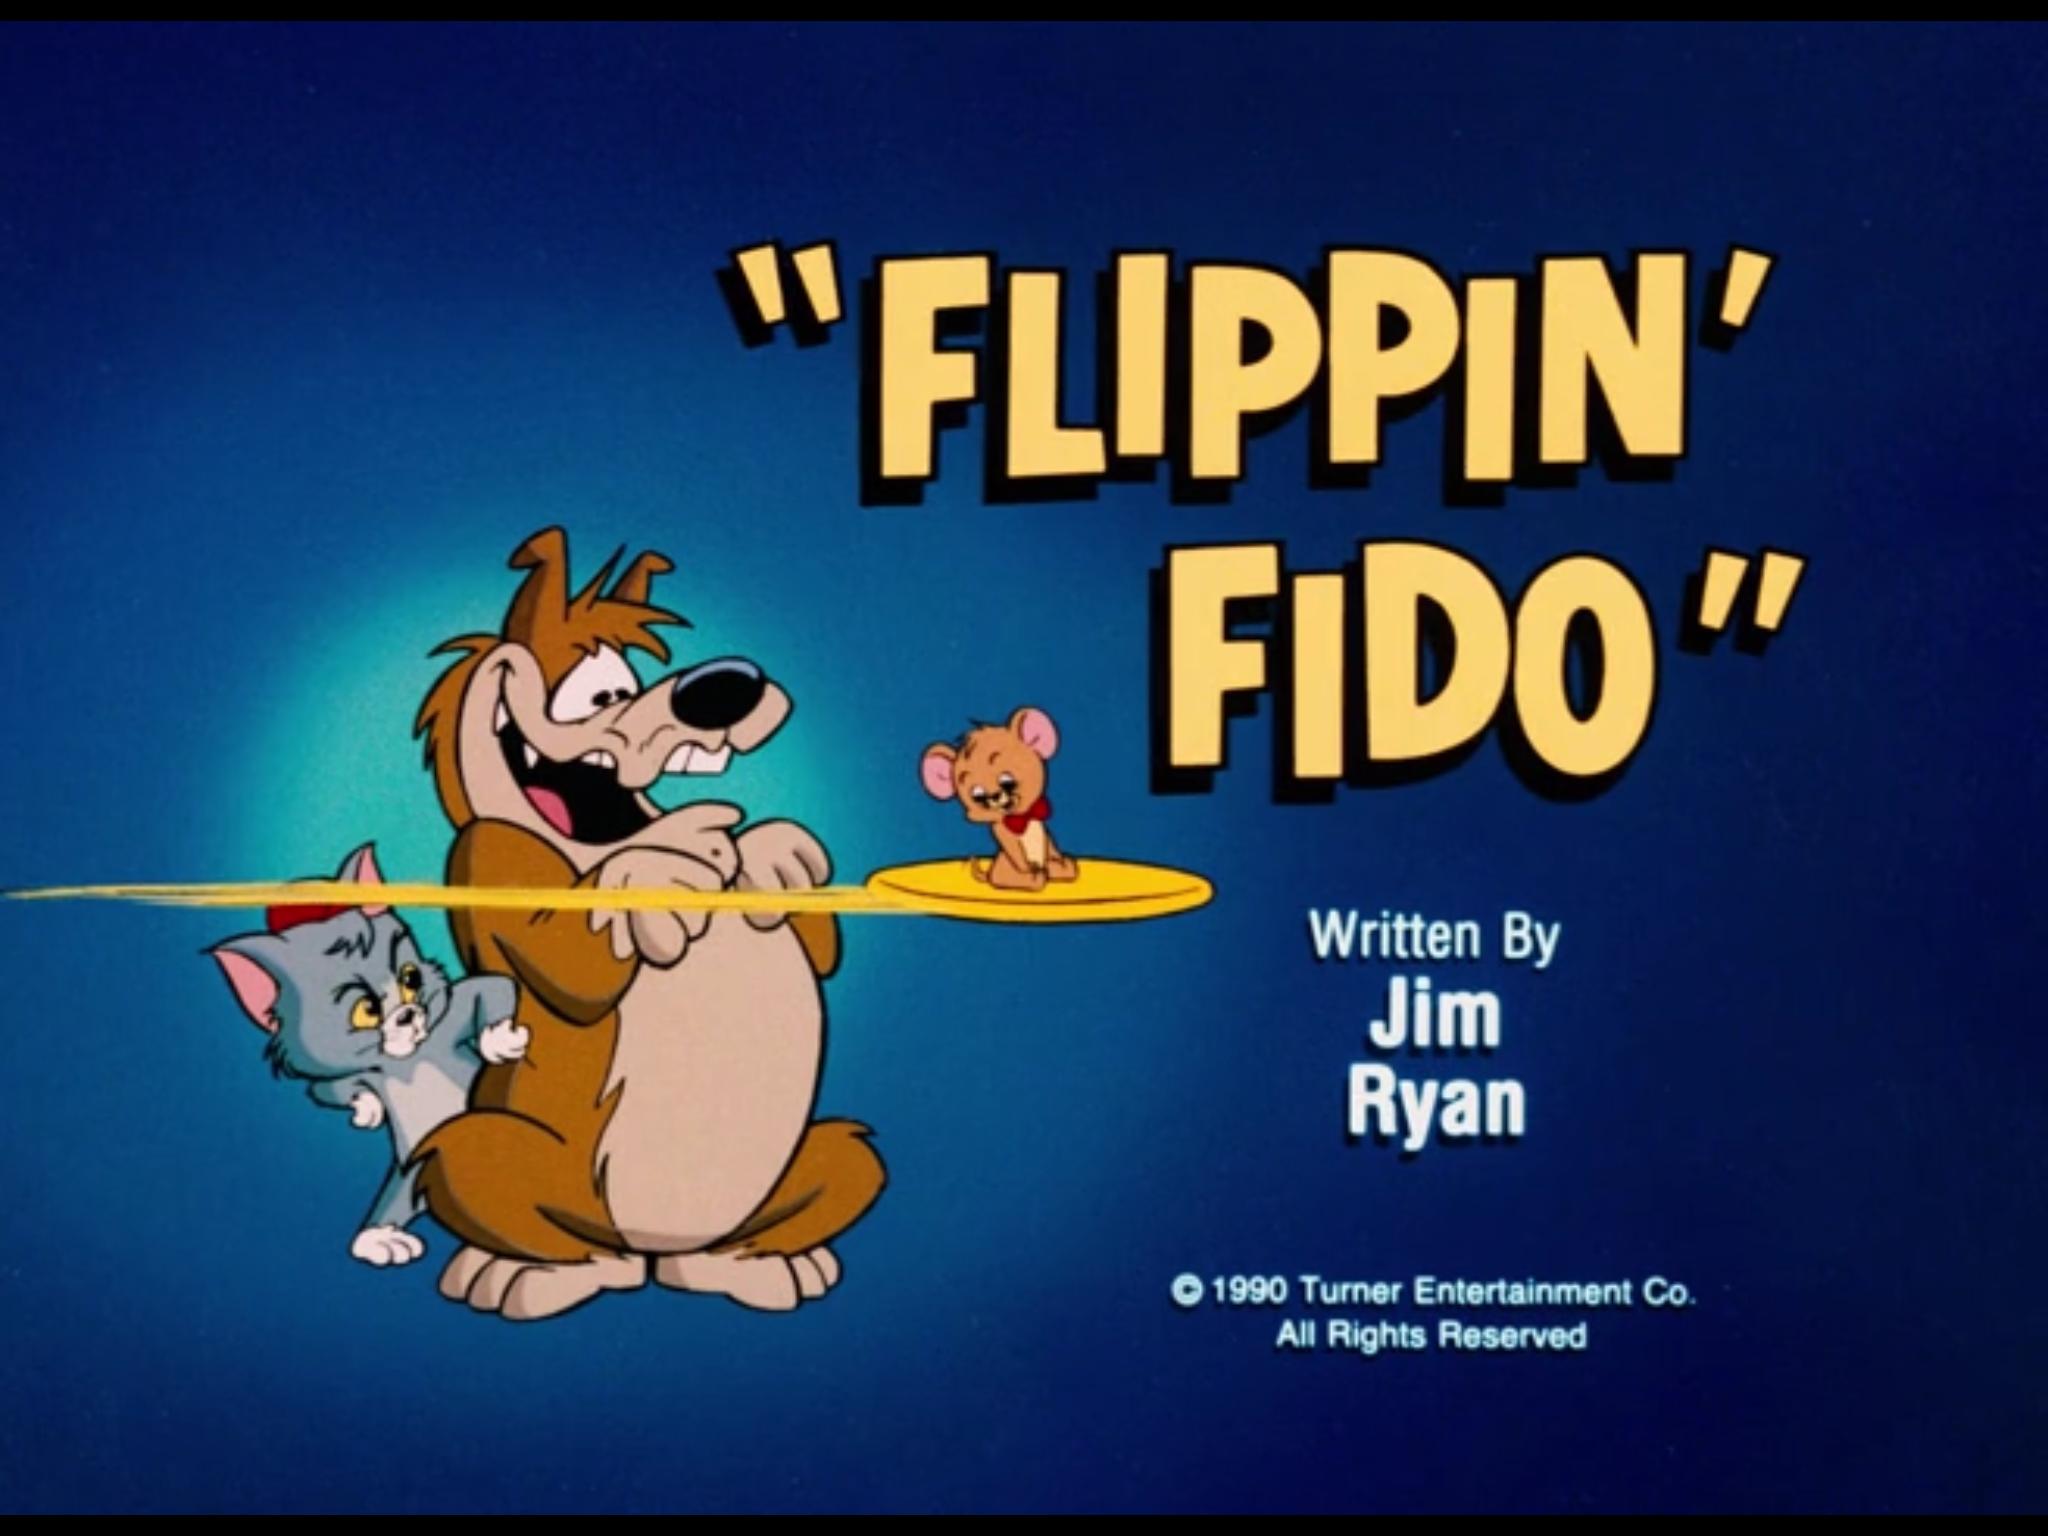 File:Flippin' Fido.png